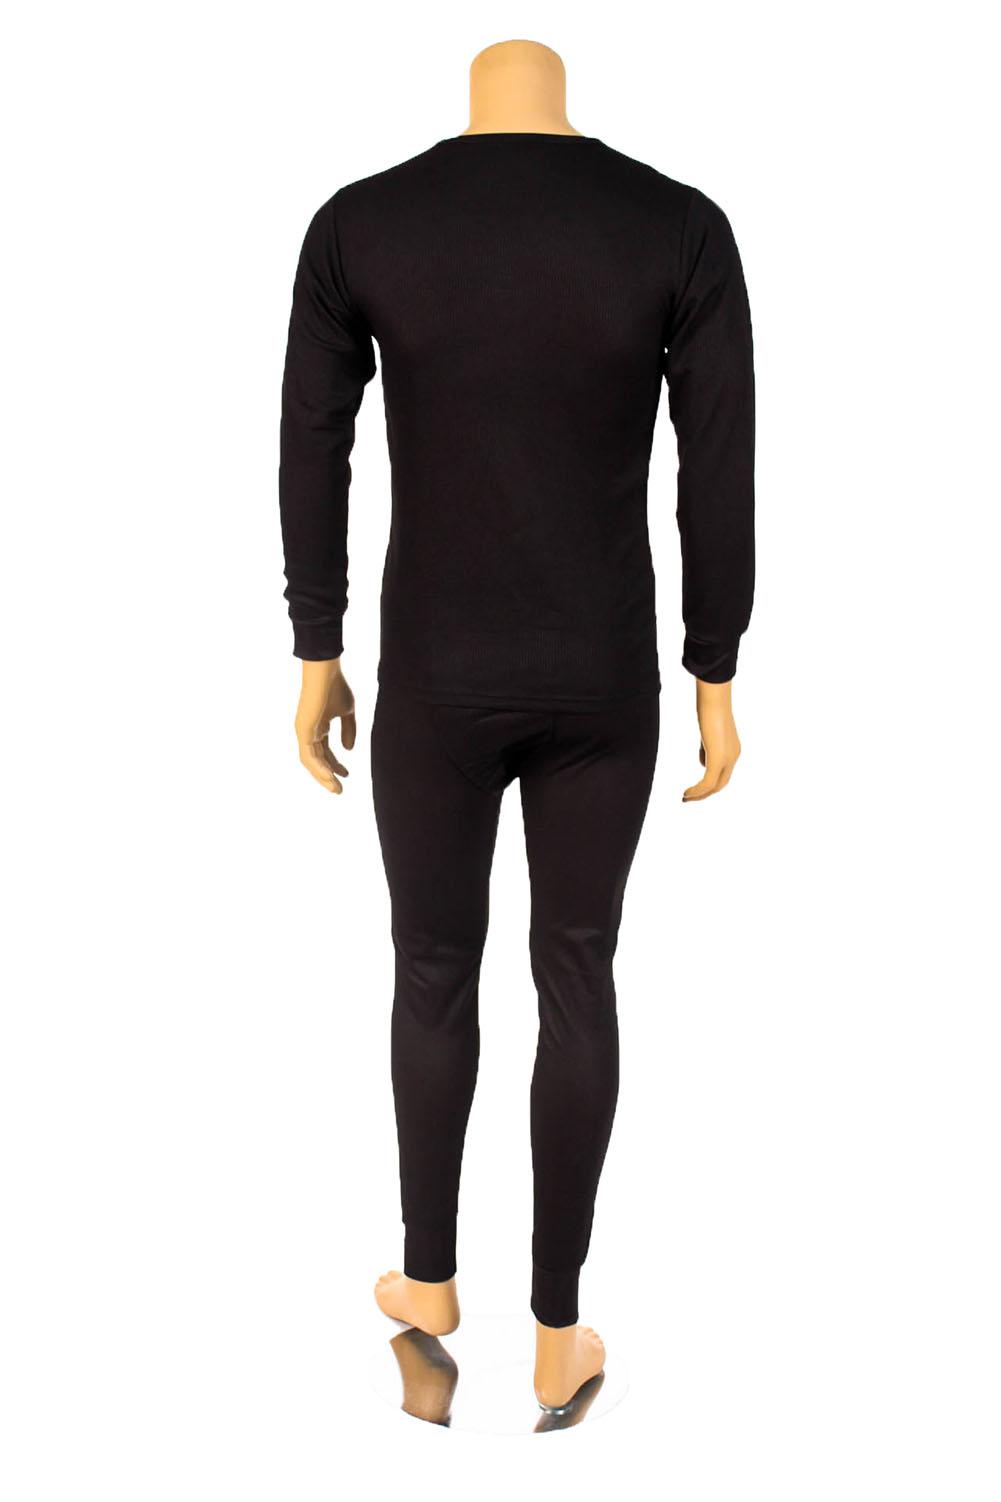 Mens-2pc-Thermal-Underwear-Set-Long-Johns-Waffle-Knit-Top-Bottom-S-M-L-XL-2X-3X